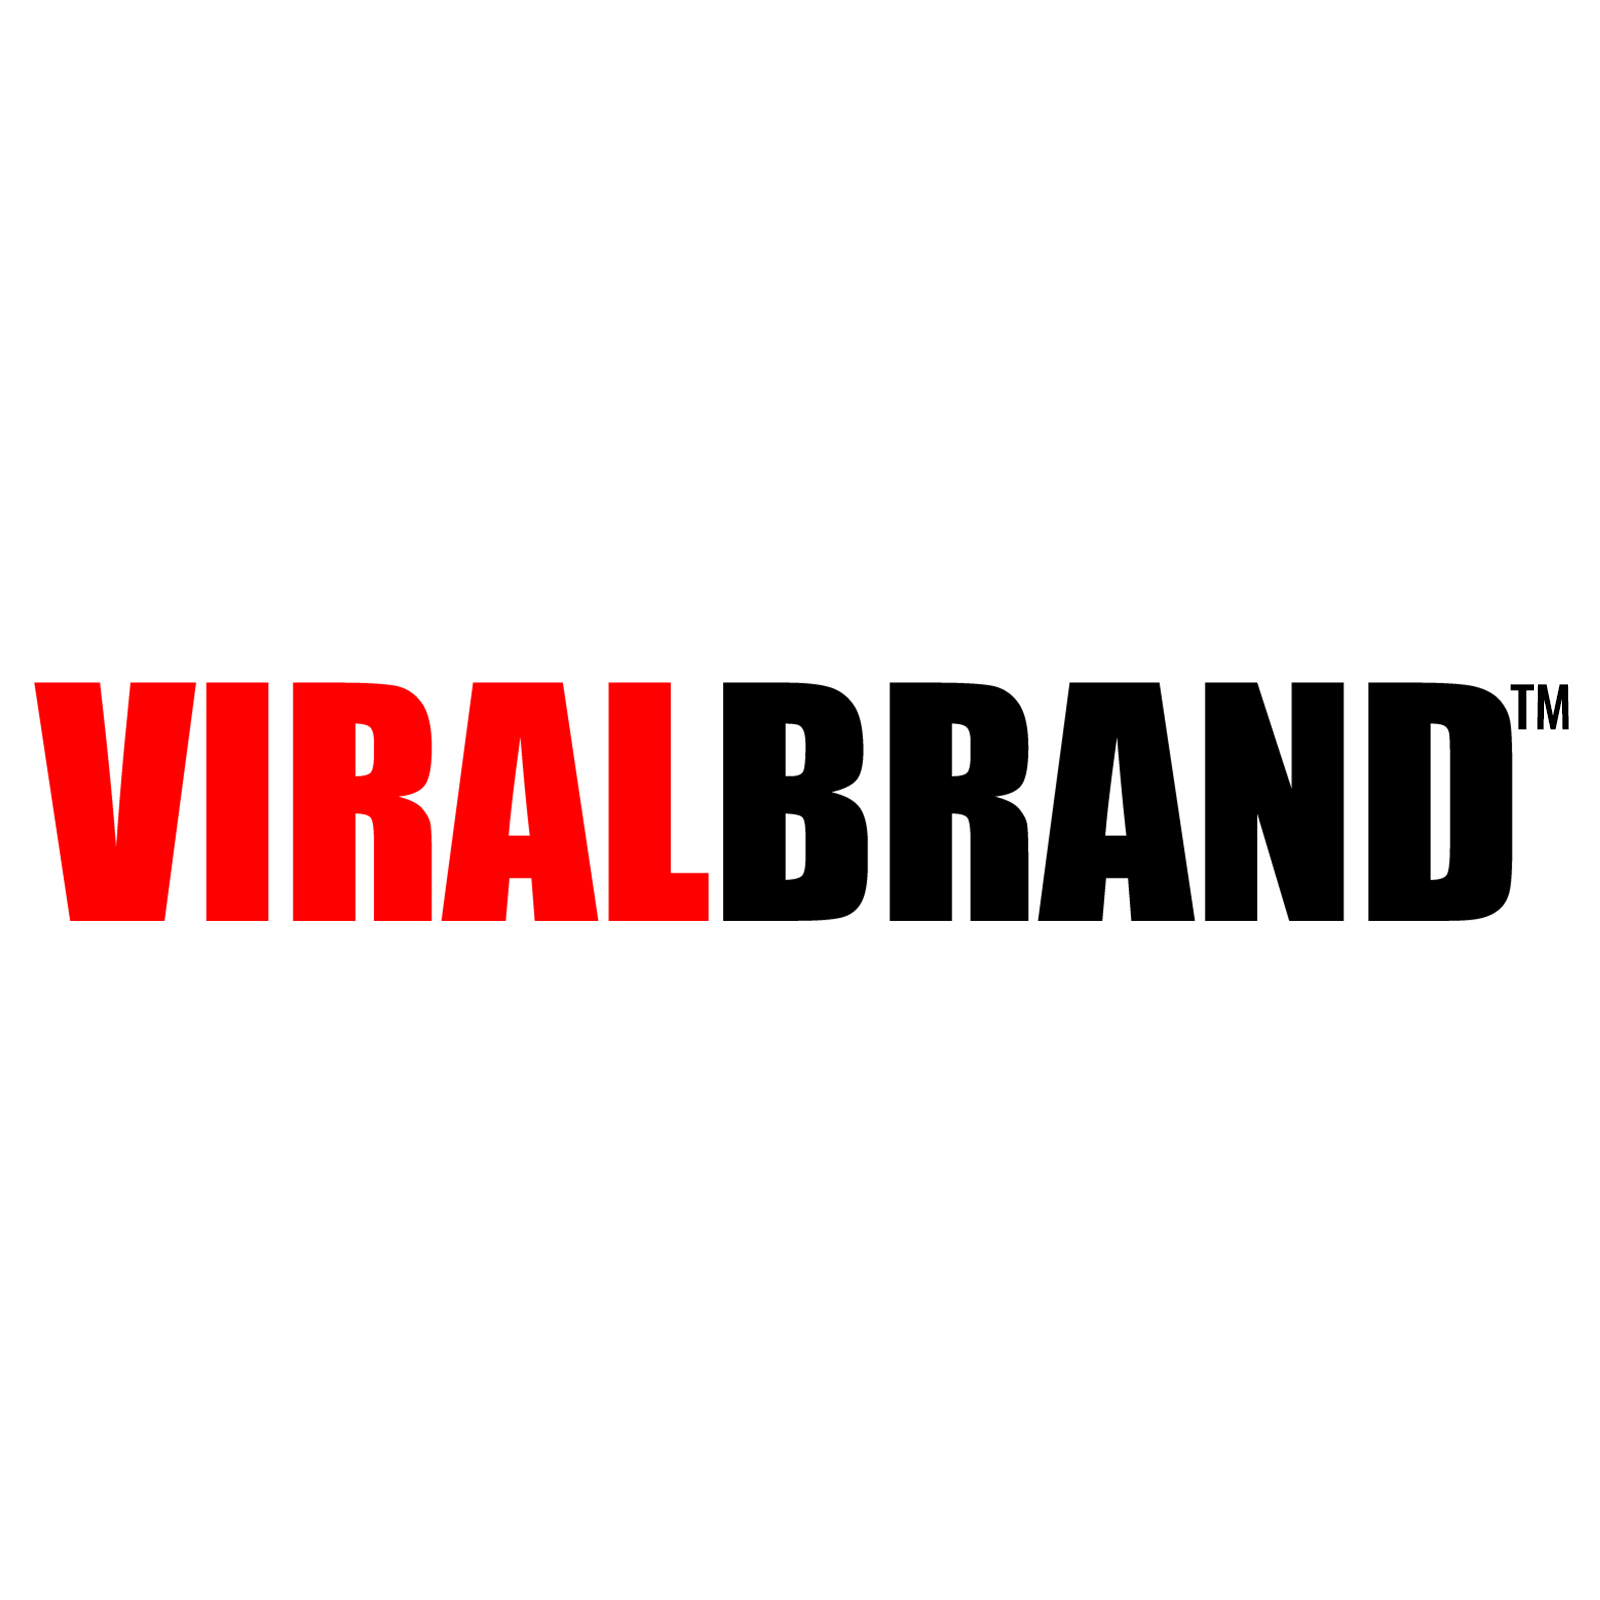 ViralBrand